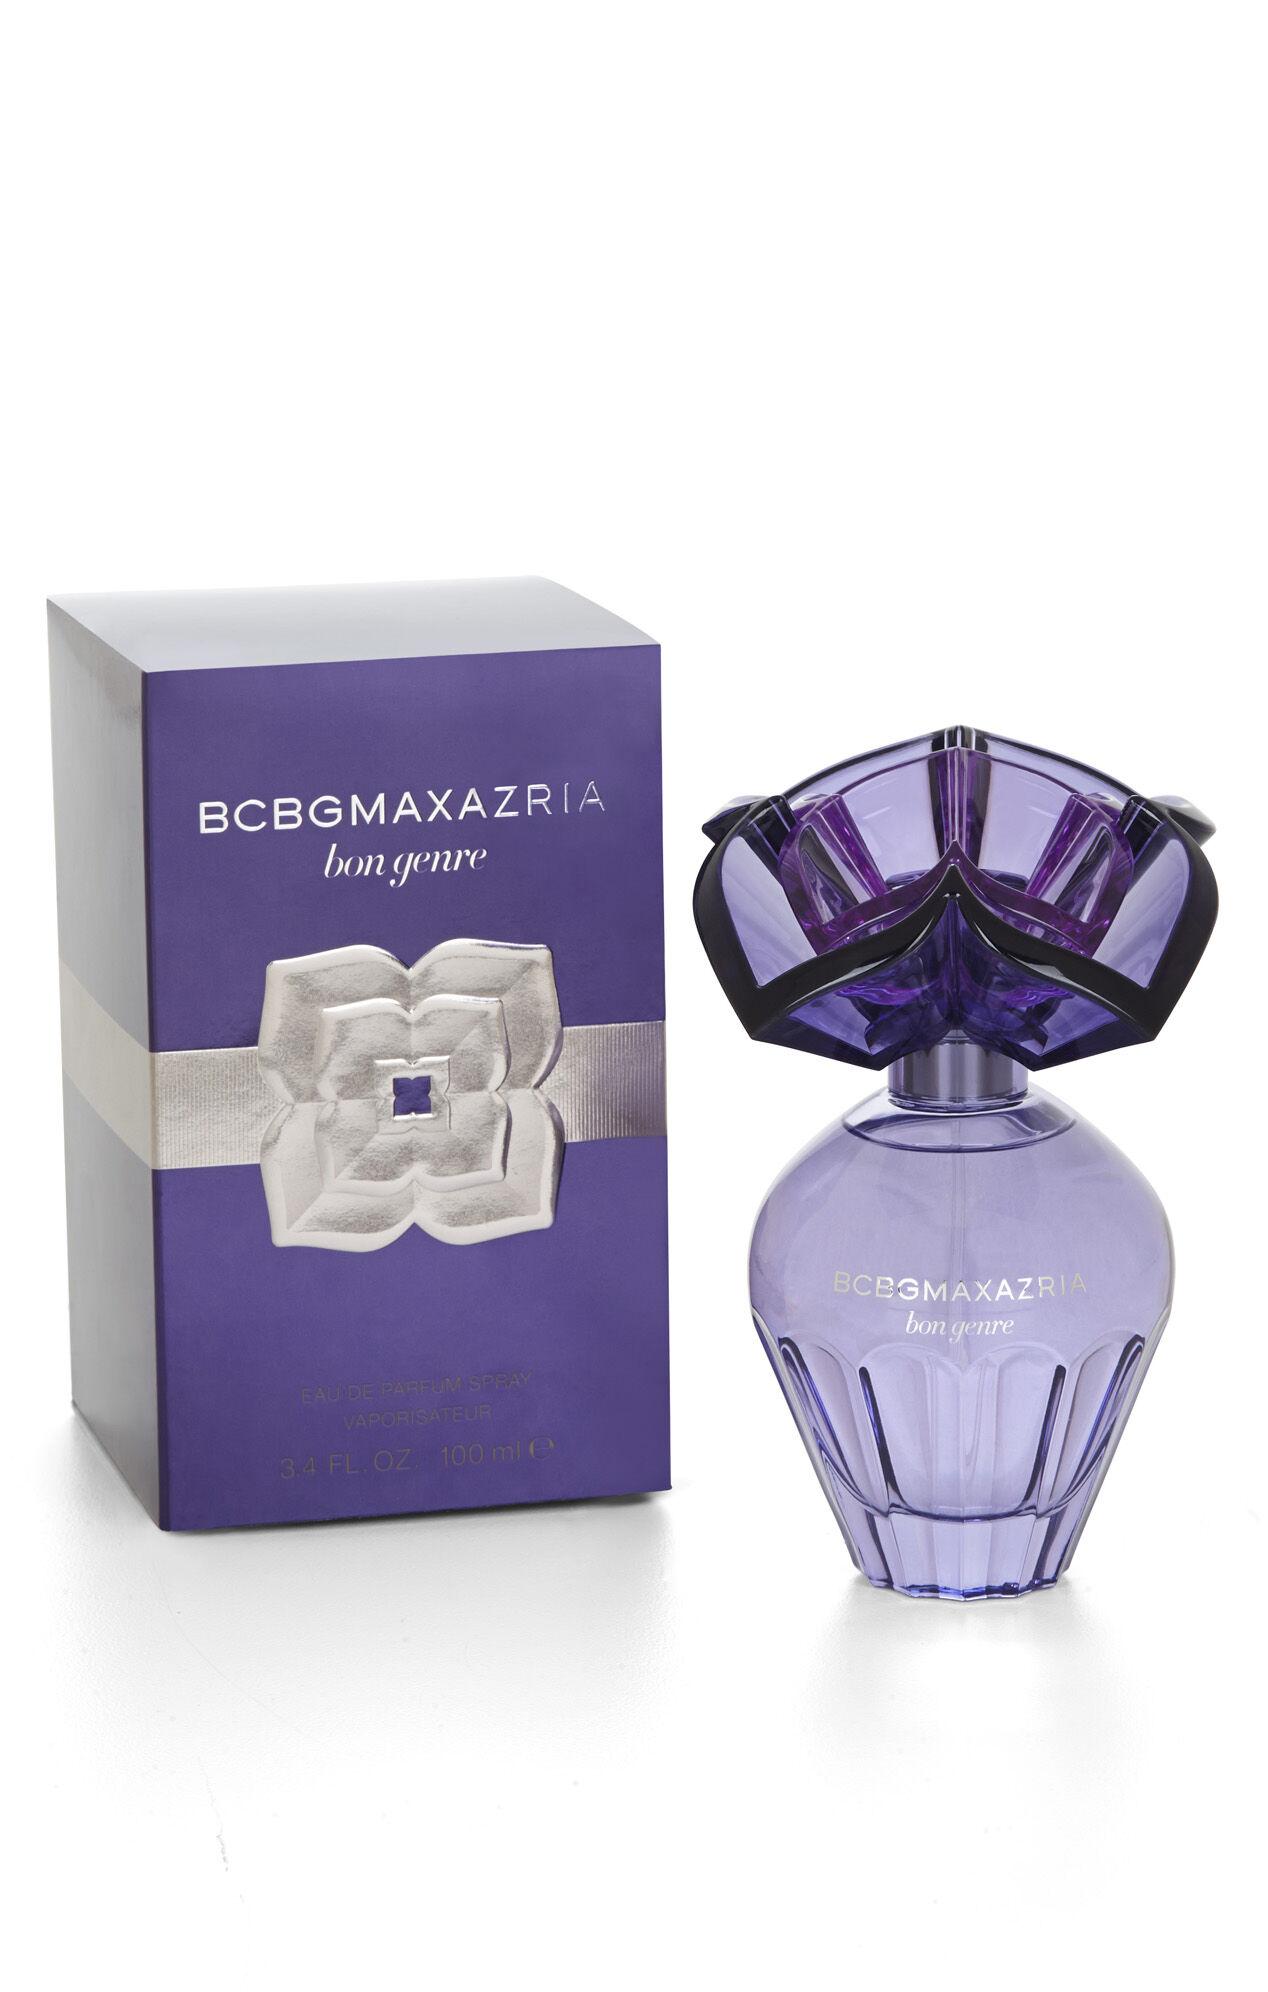 BCBGMAXAZRIA Bon Genre Fragrance